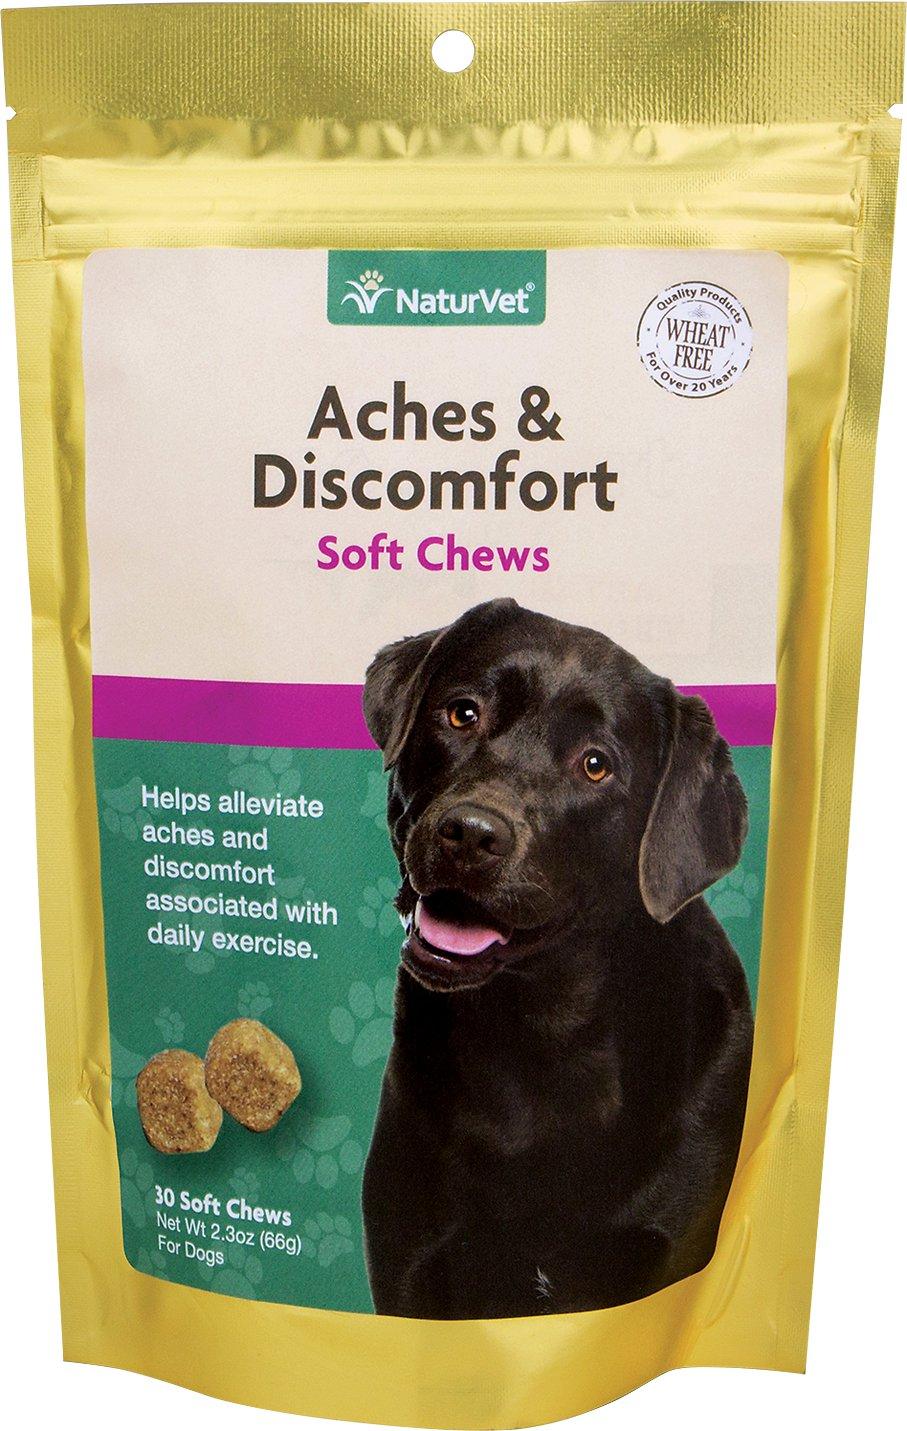 NaturVet Aches & Discomfort Dog Soft Chews, 30 count